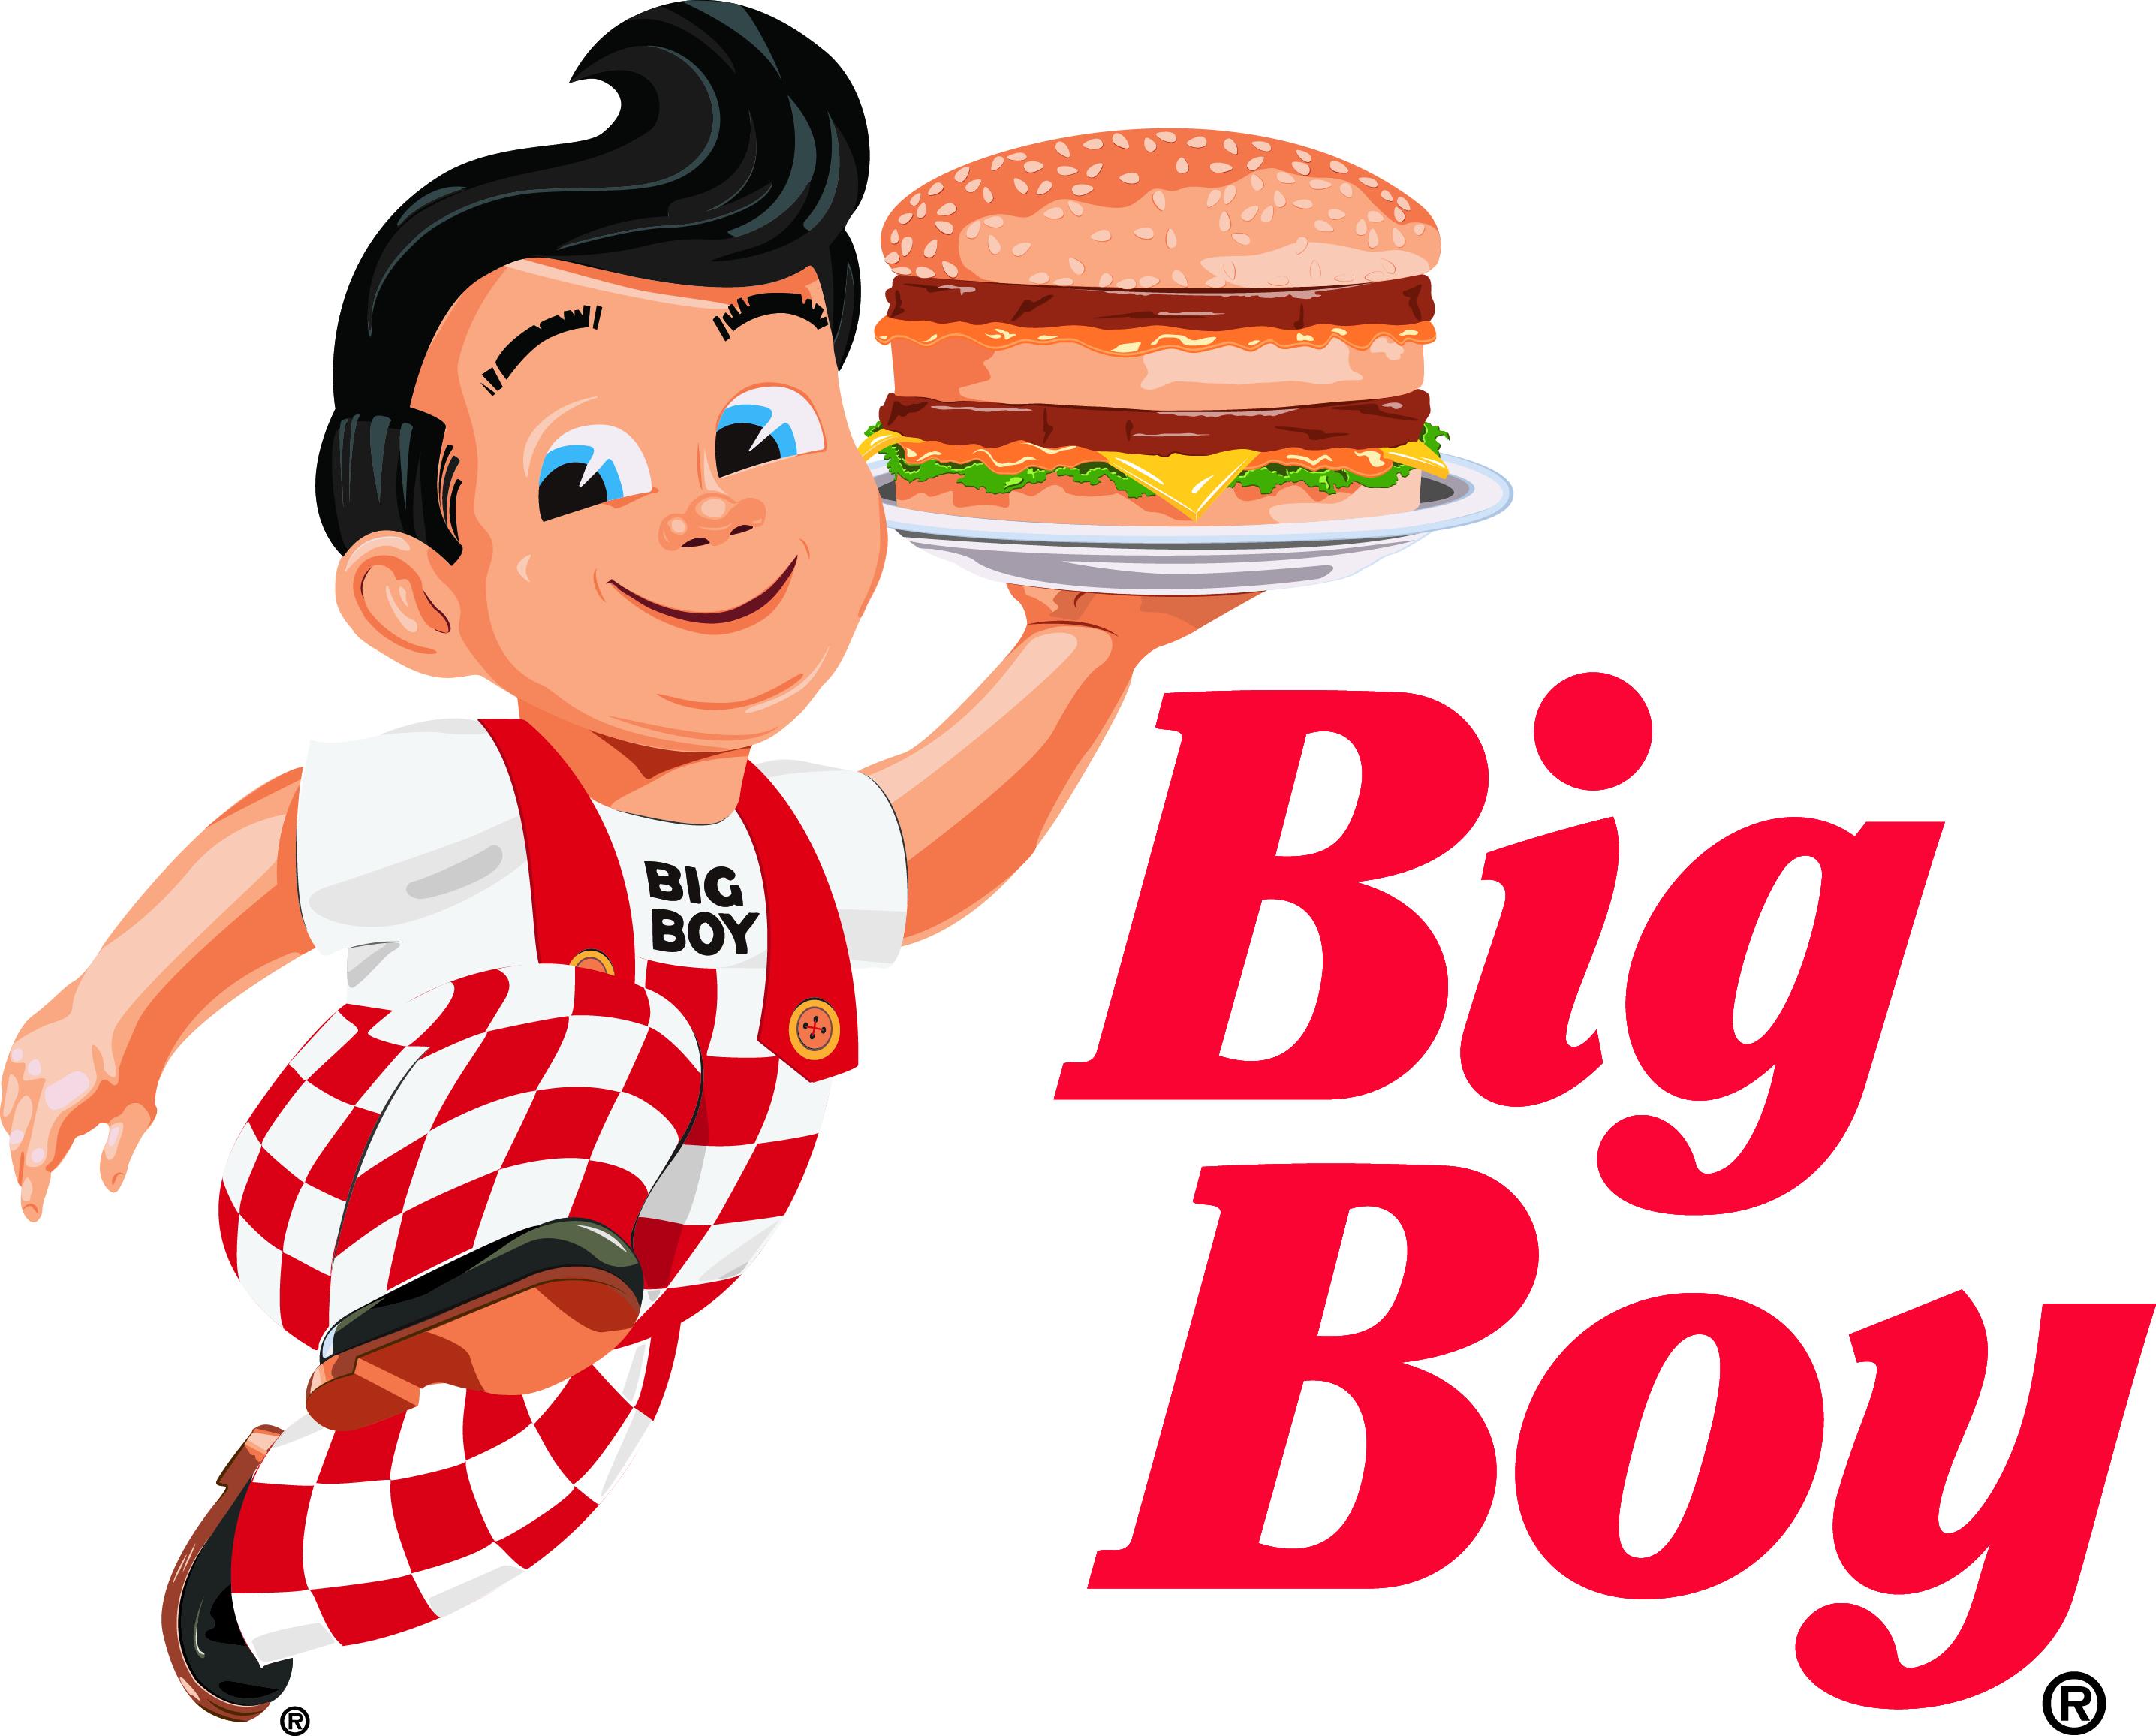 Big boy Logos.